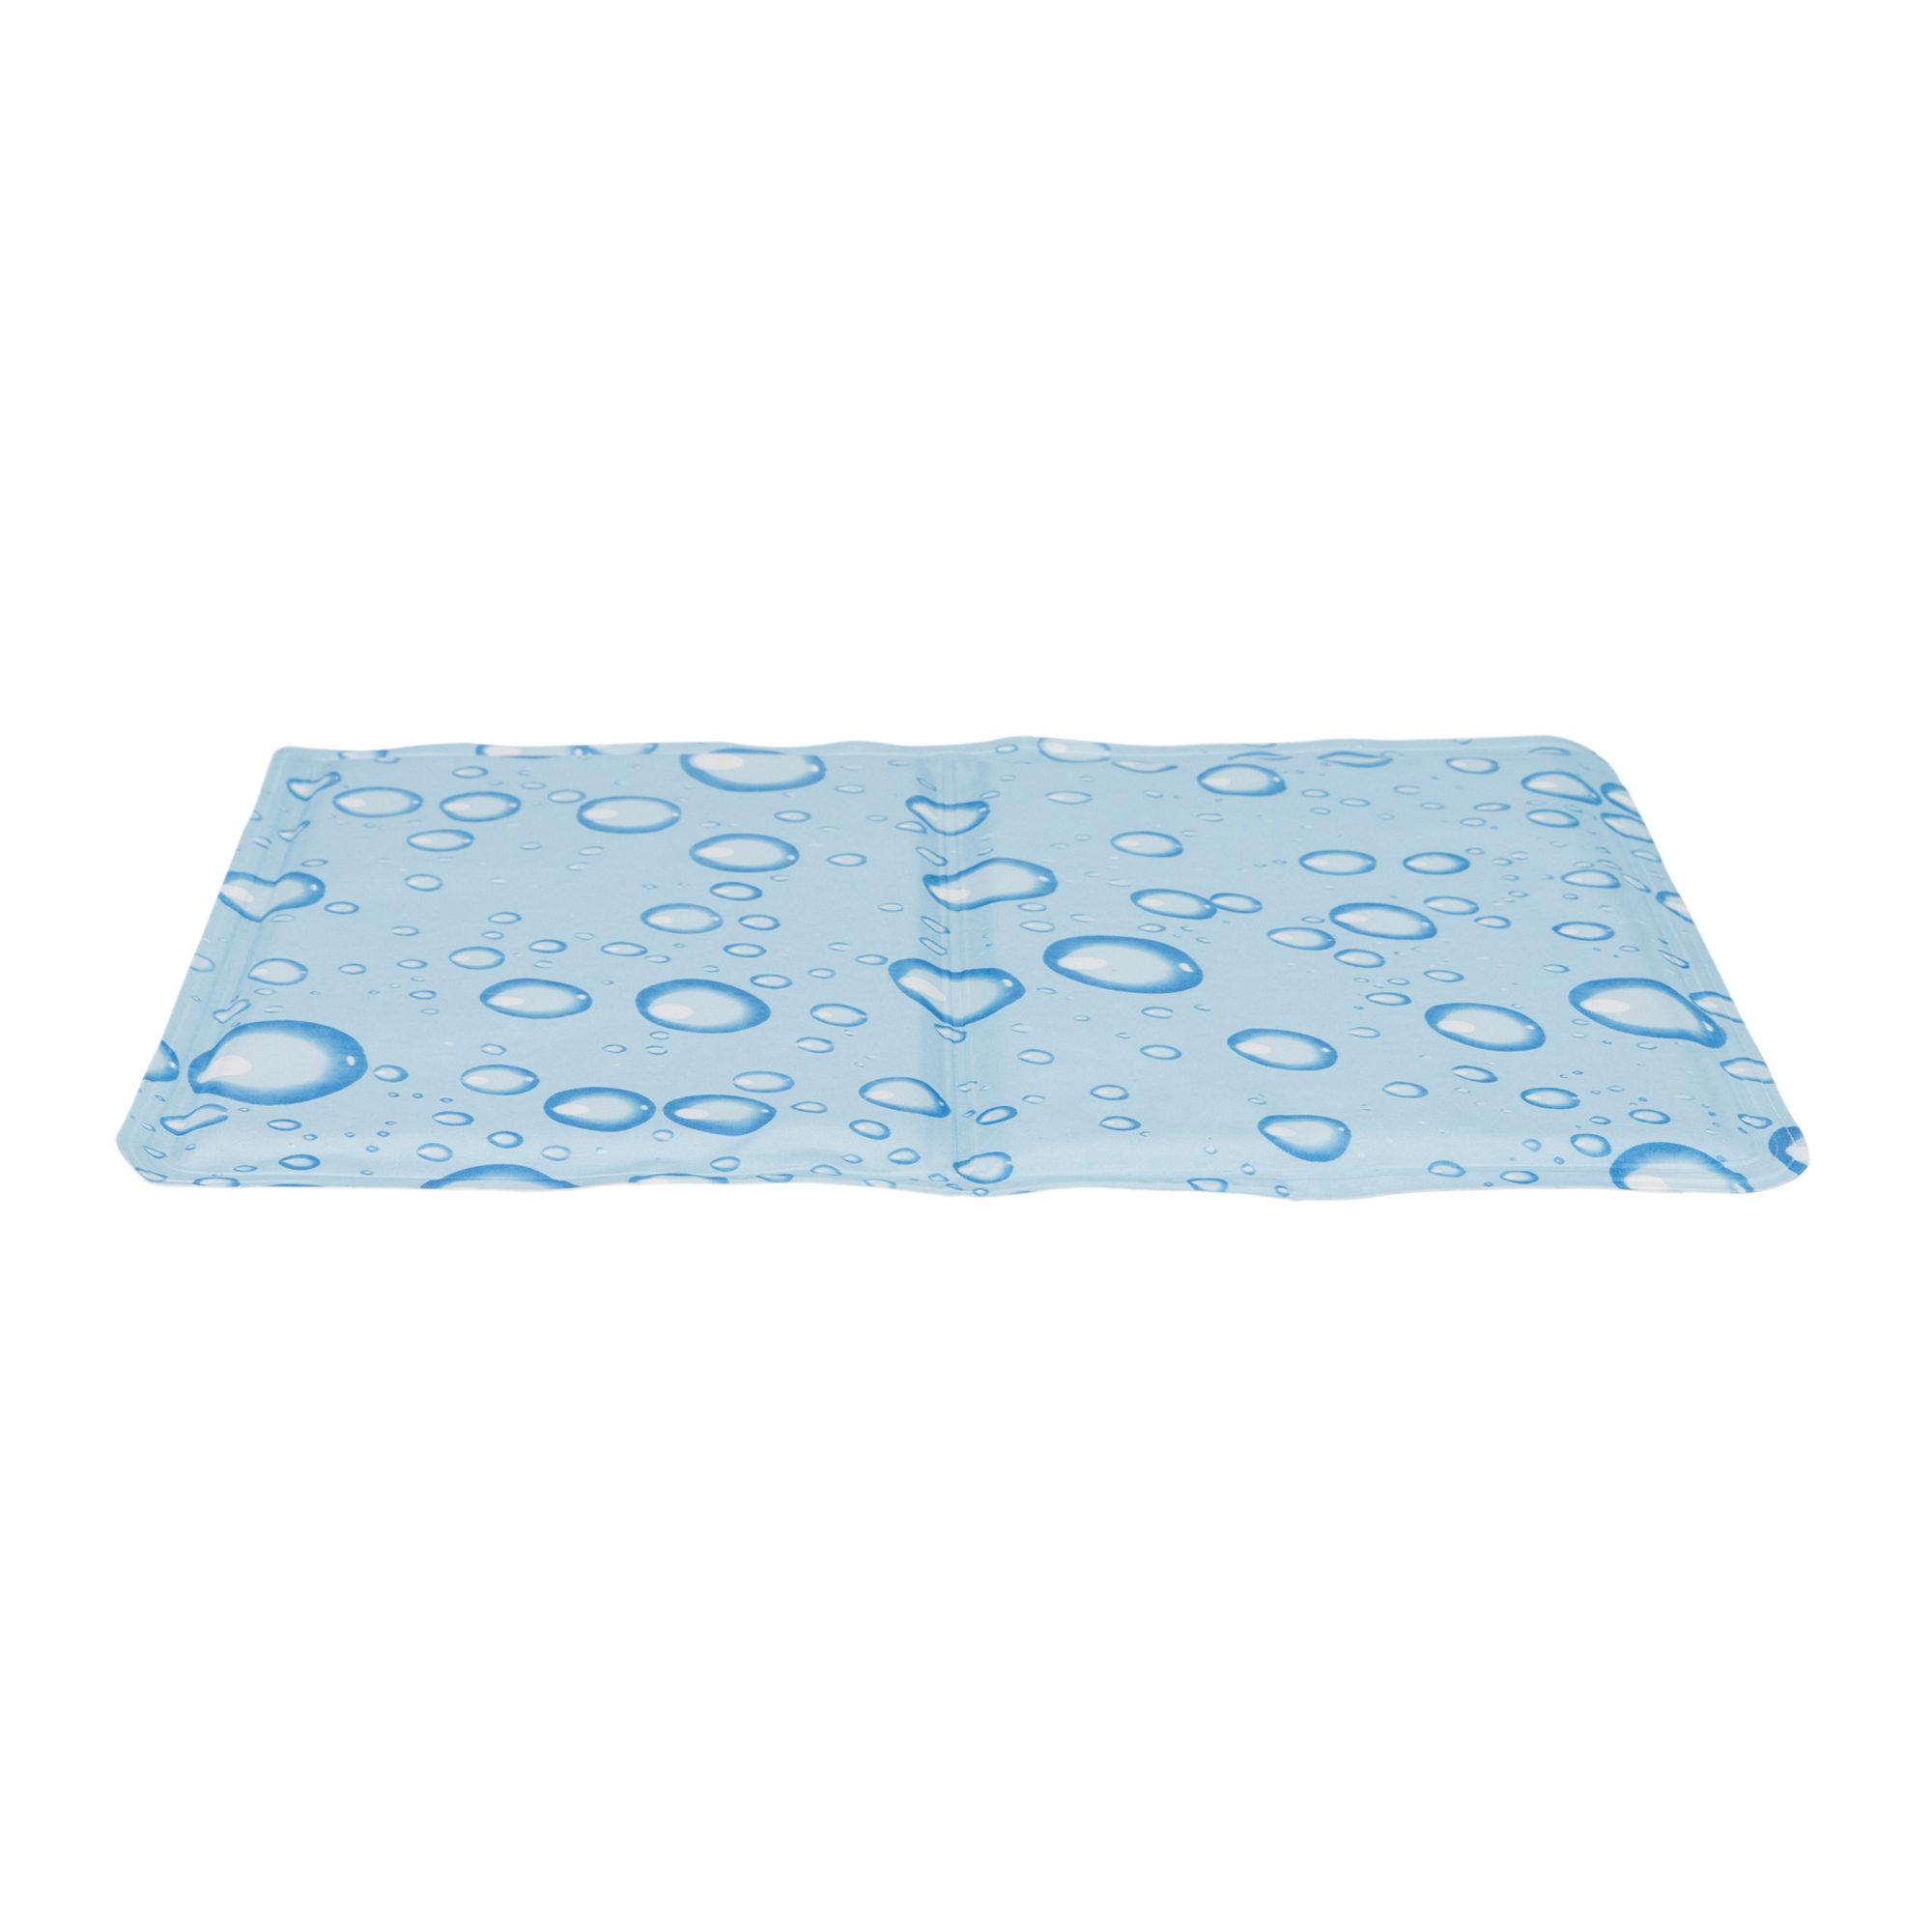 Trixie Kühlmatte - Tropfen Hellblau - 40 x 30 cm